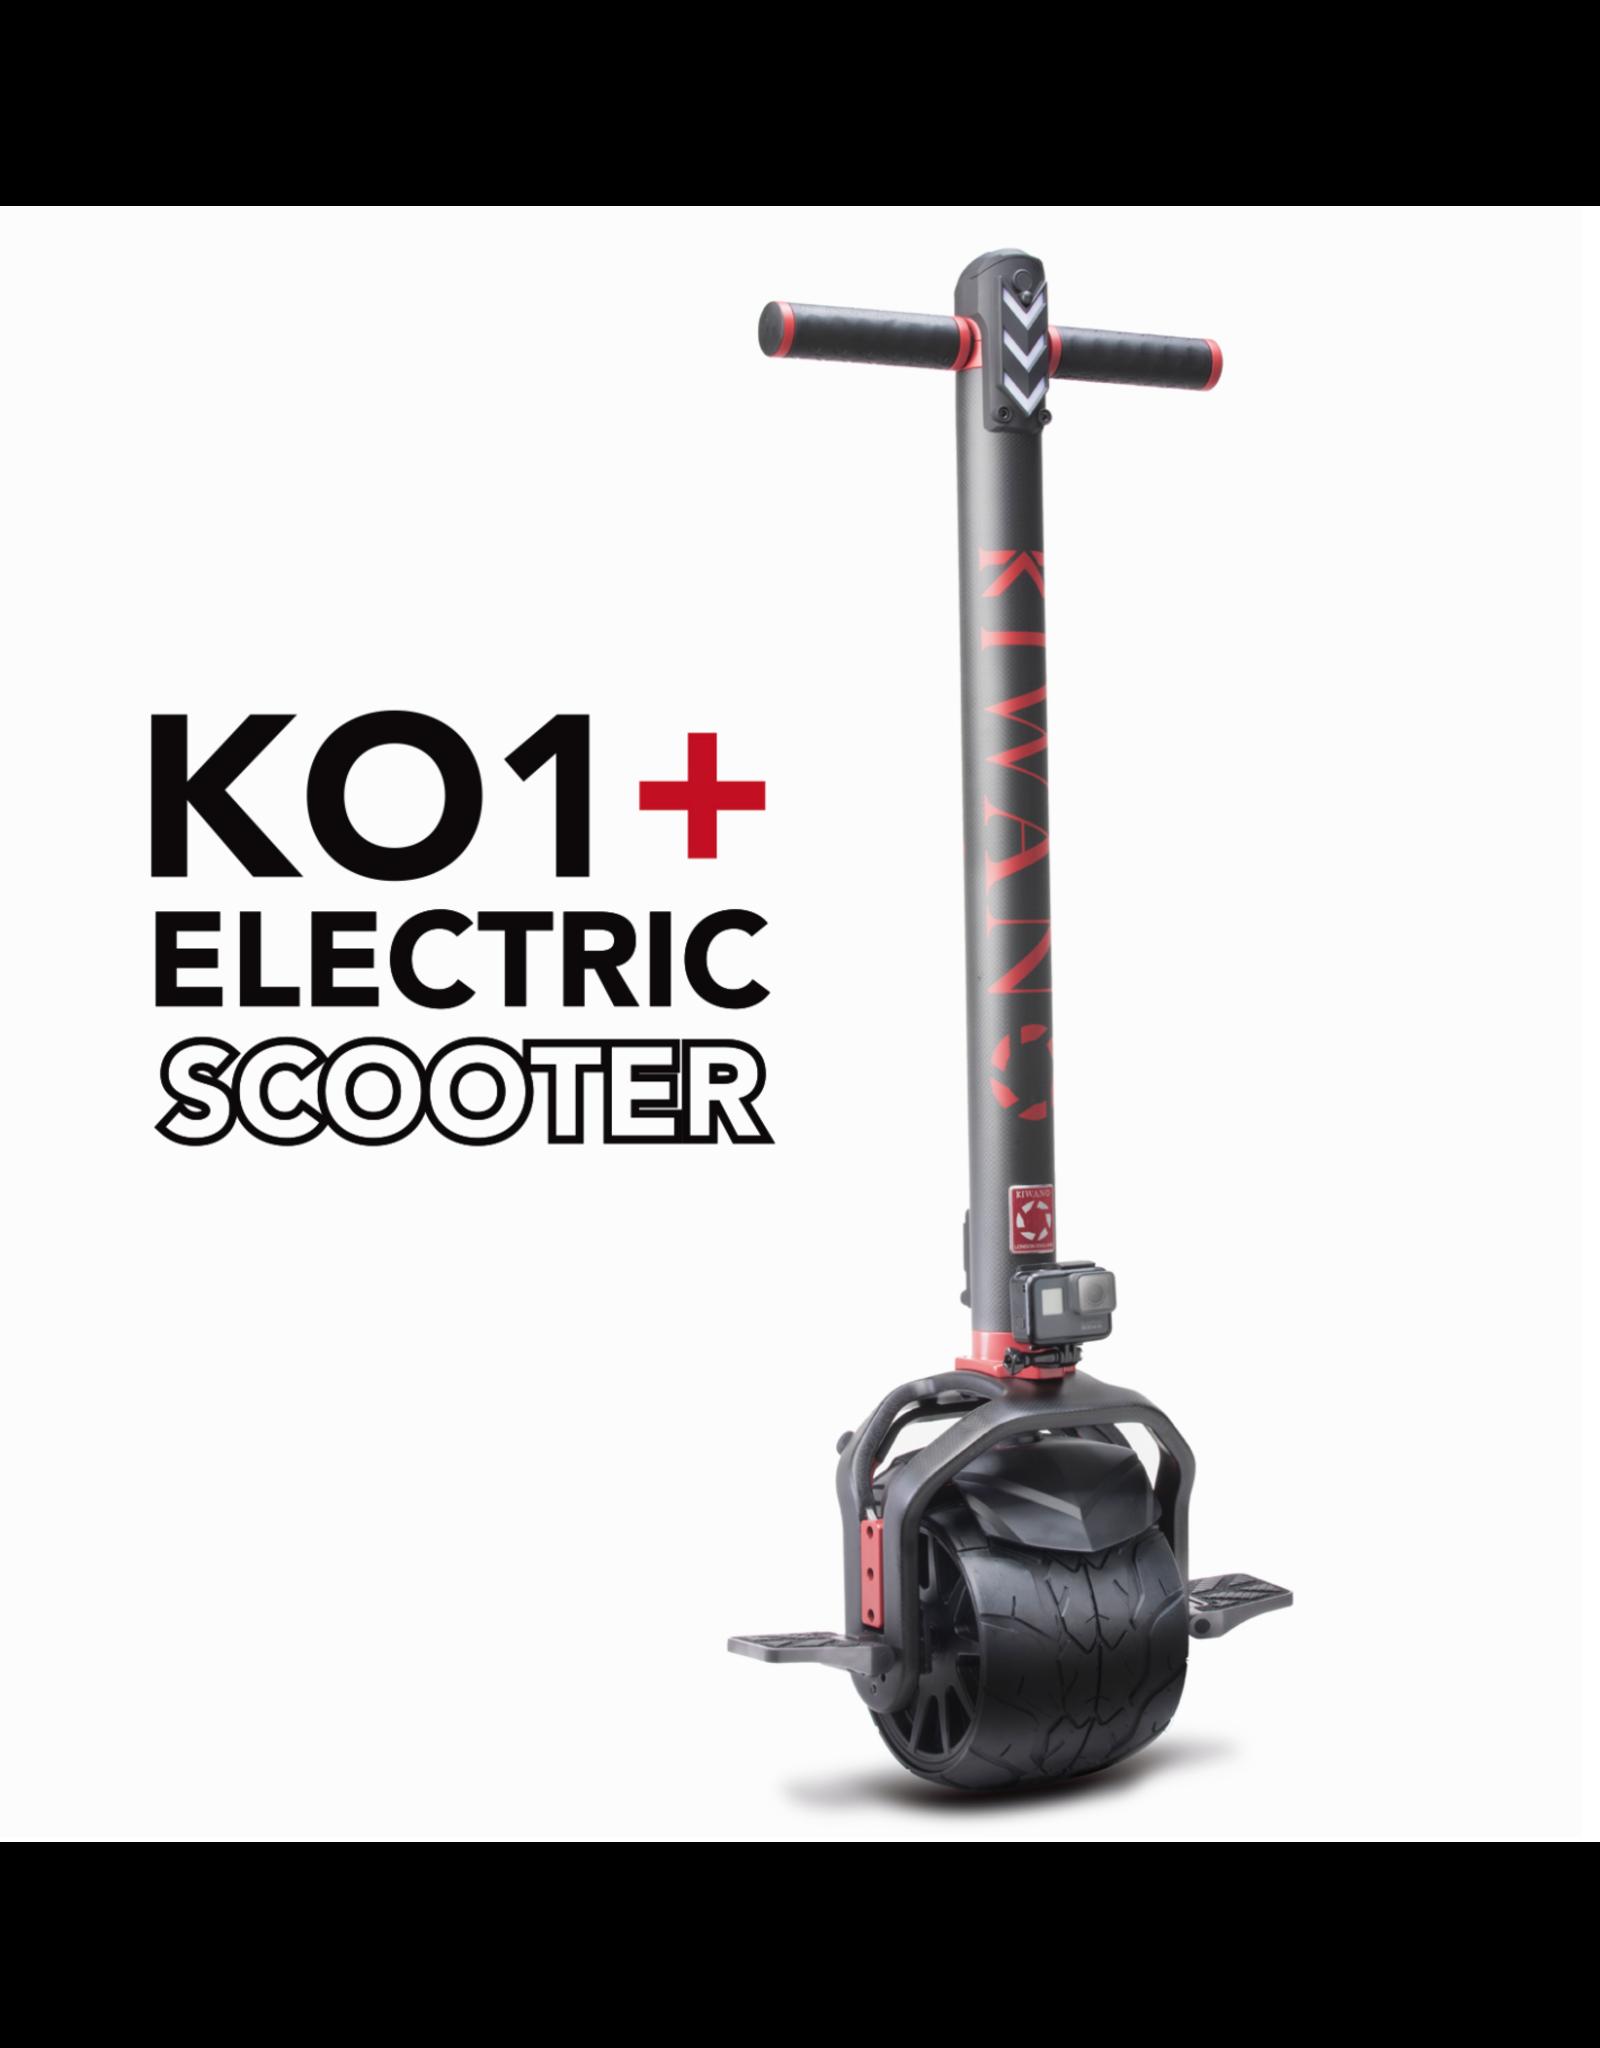 Kiwano KIWANO K01+ Electric Scooter